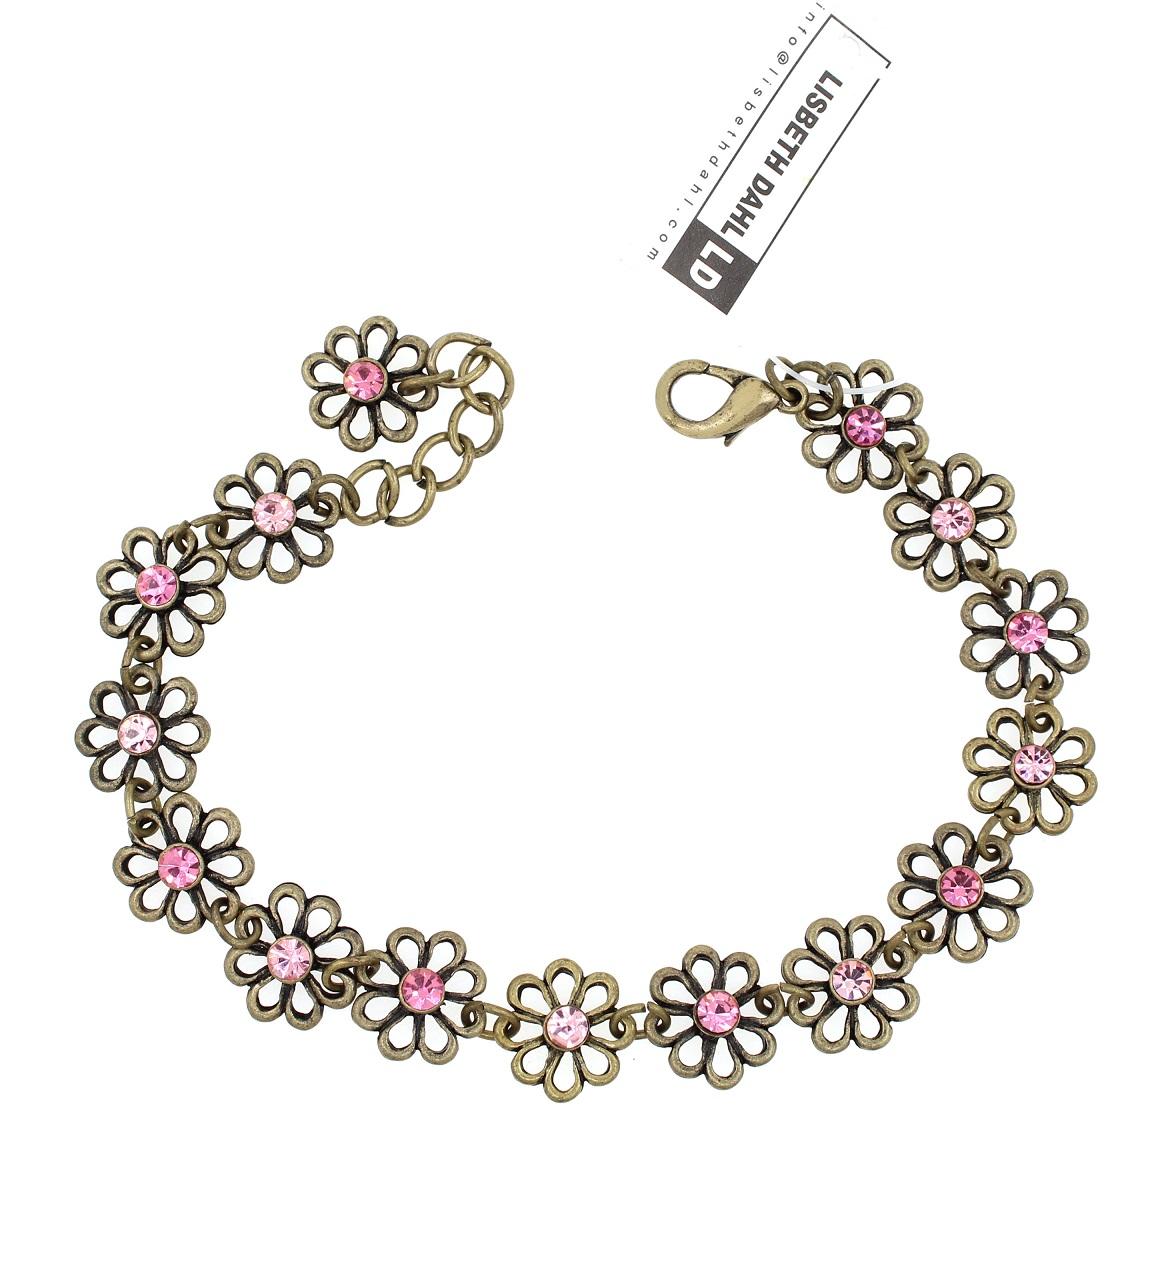 Lisbeth Dahl - Daisy Chain Bracelet - Vintage Gold/Pink Crystals BNWT